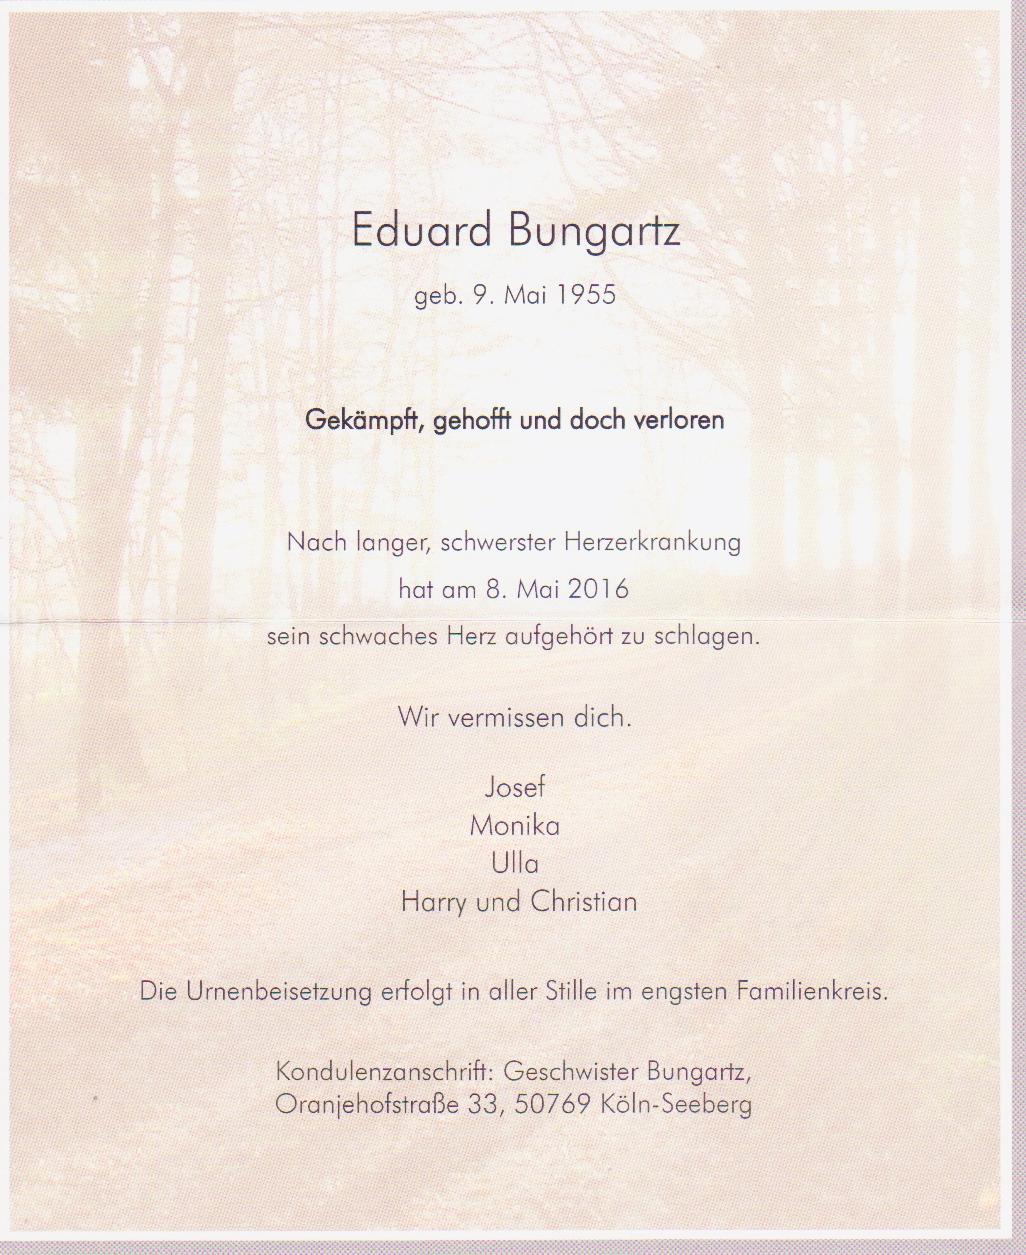 Tod Eduard Bungaartz